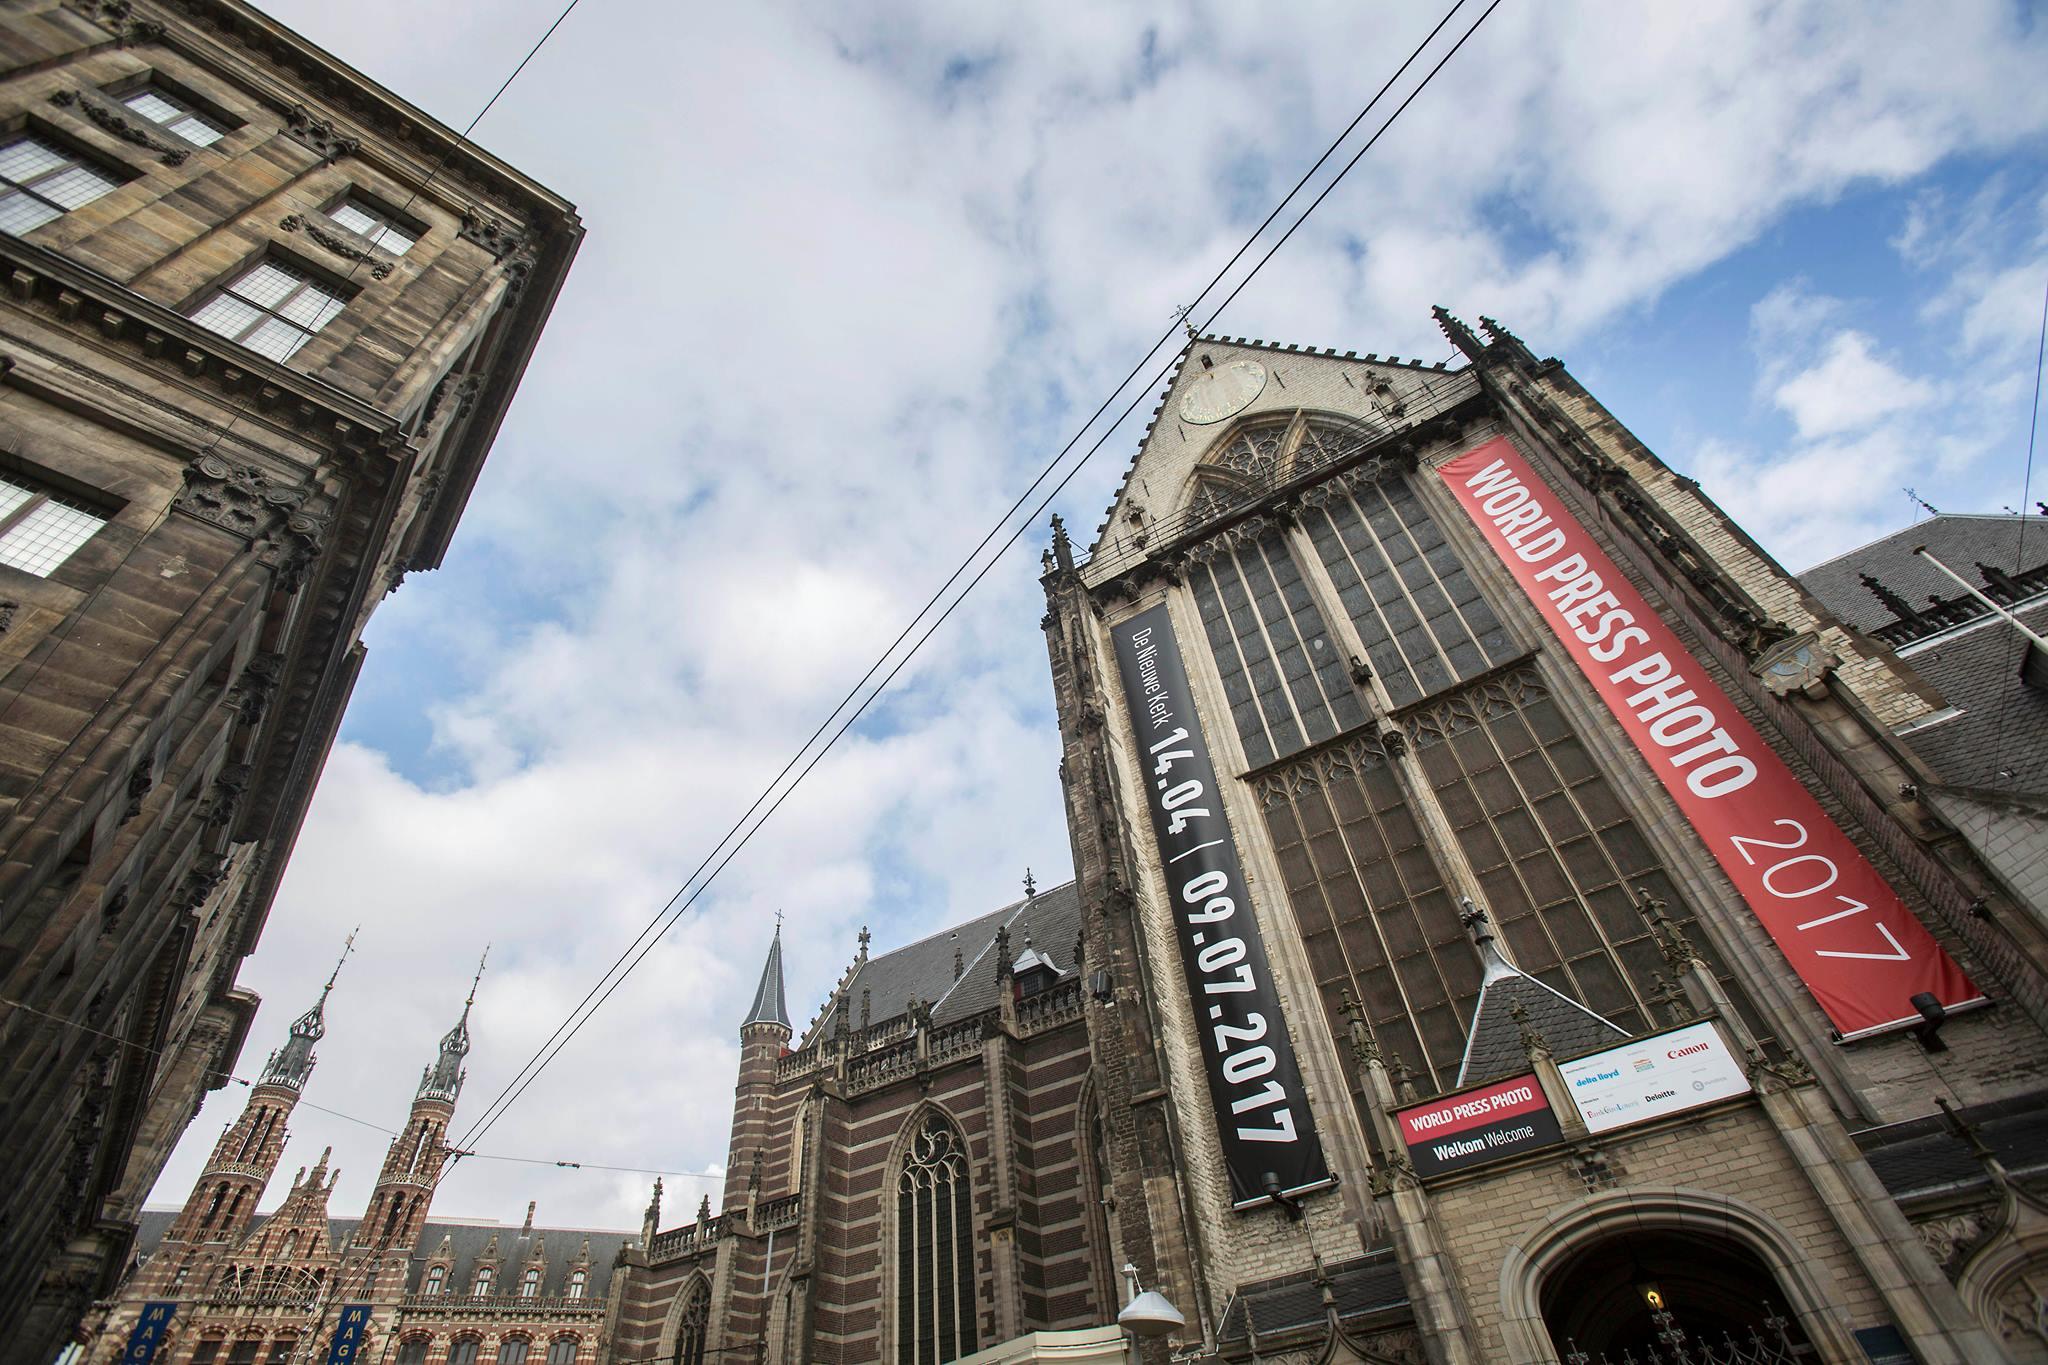 World Press Photo Amsterdam - Daily Cappuccino - Lifestyle Blog